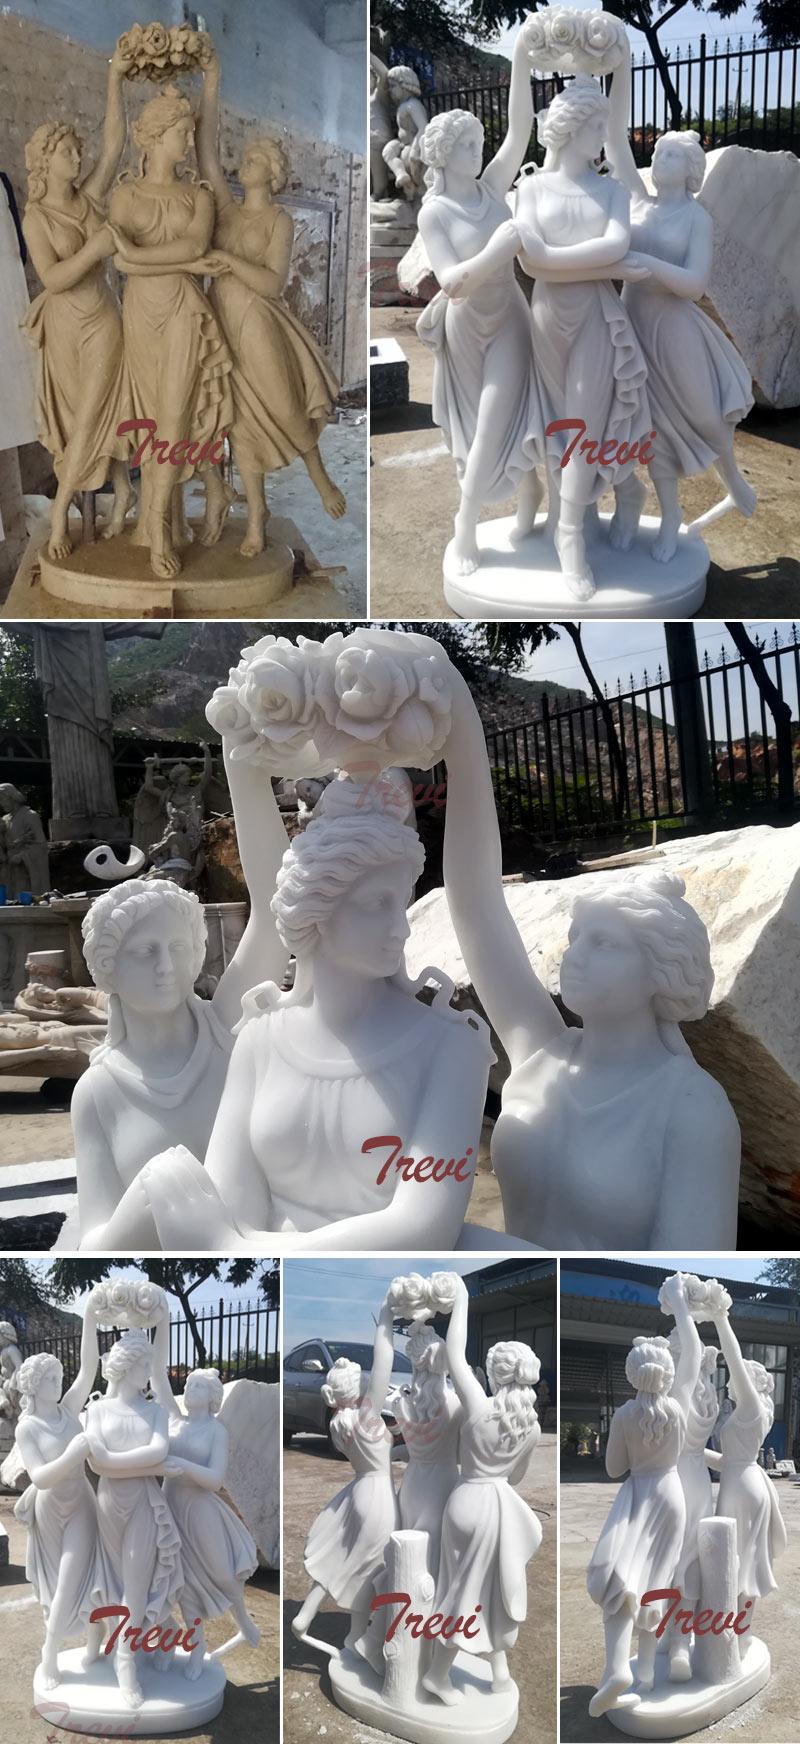 The three grace marble garden sculpture louvre for sale details